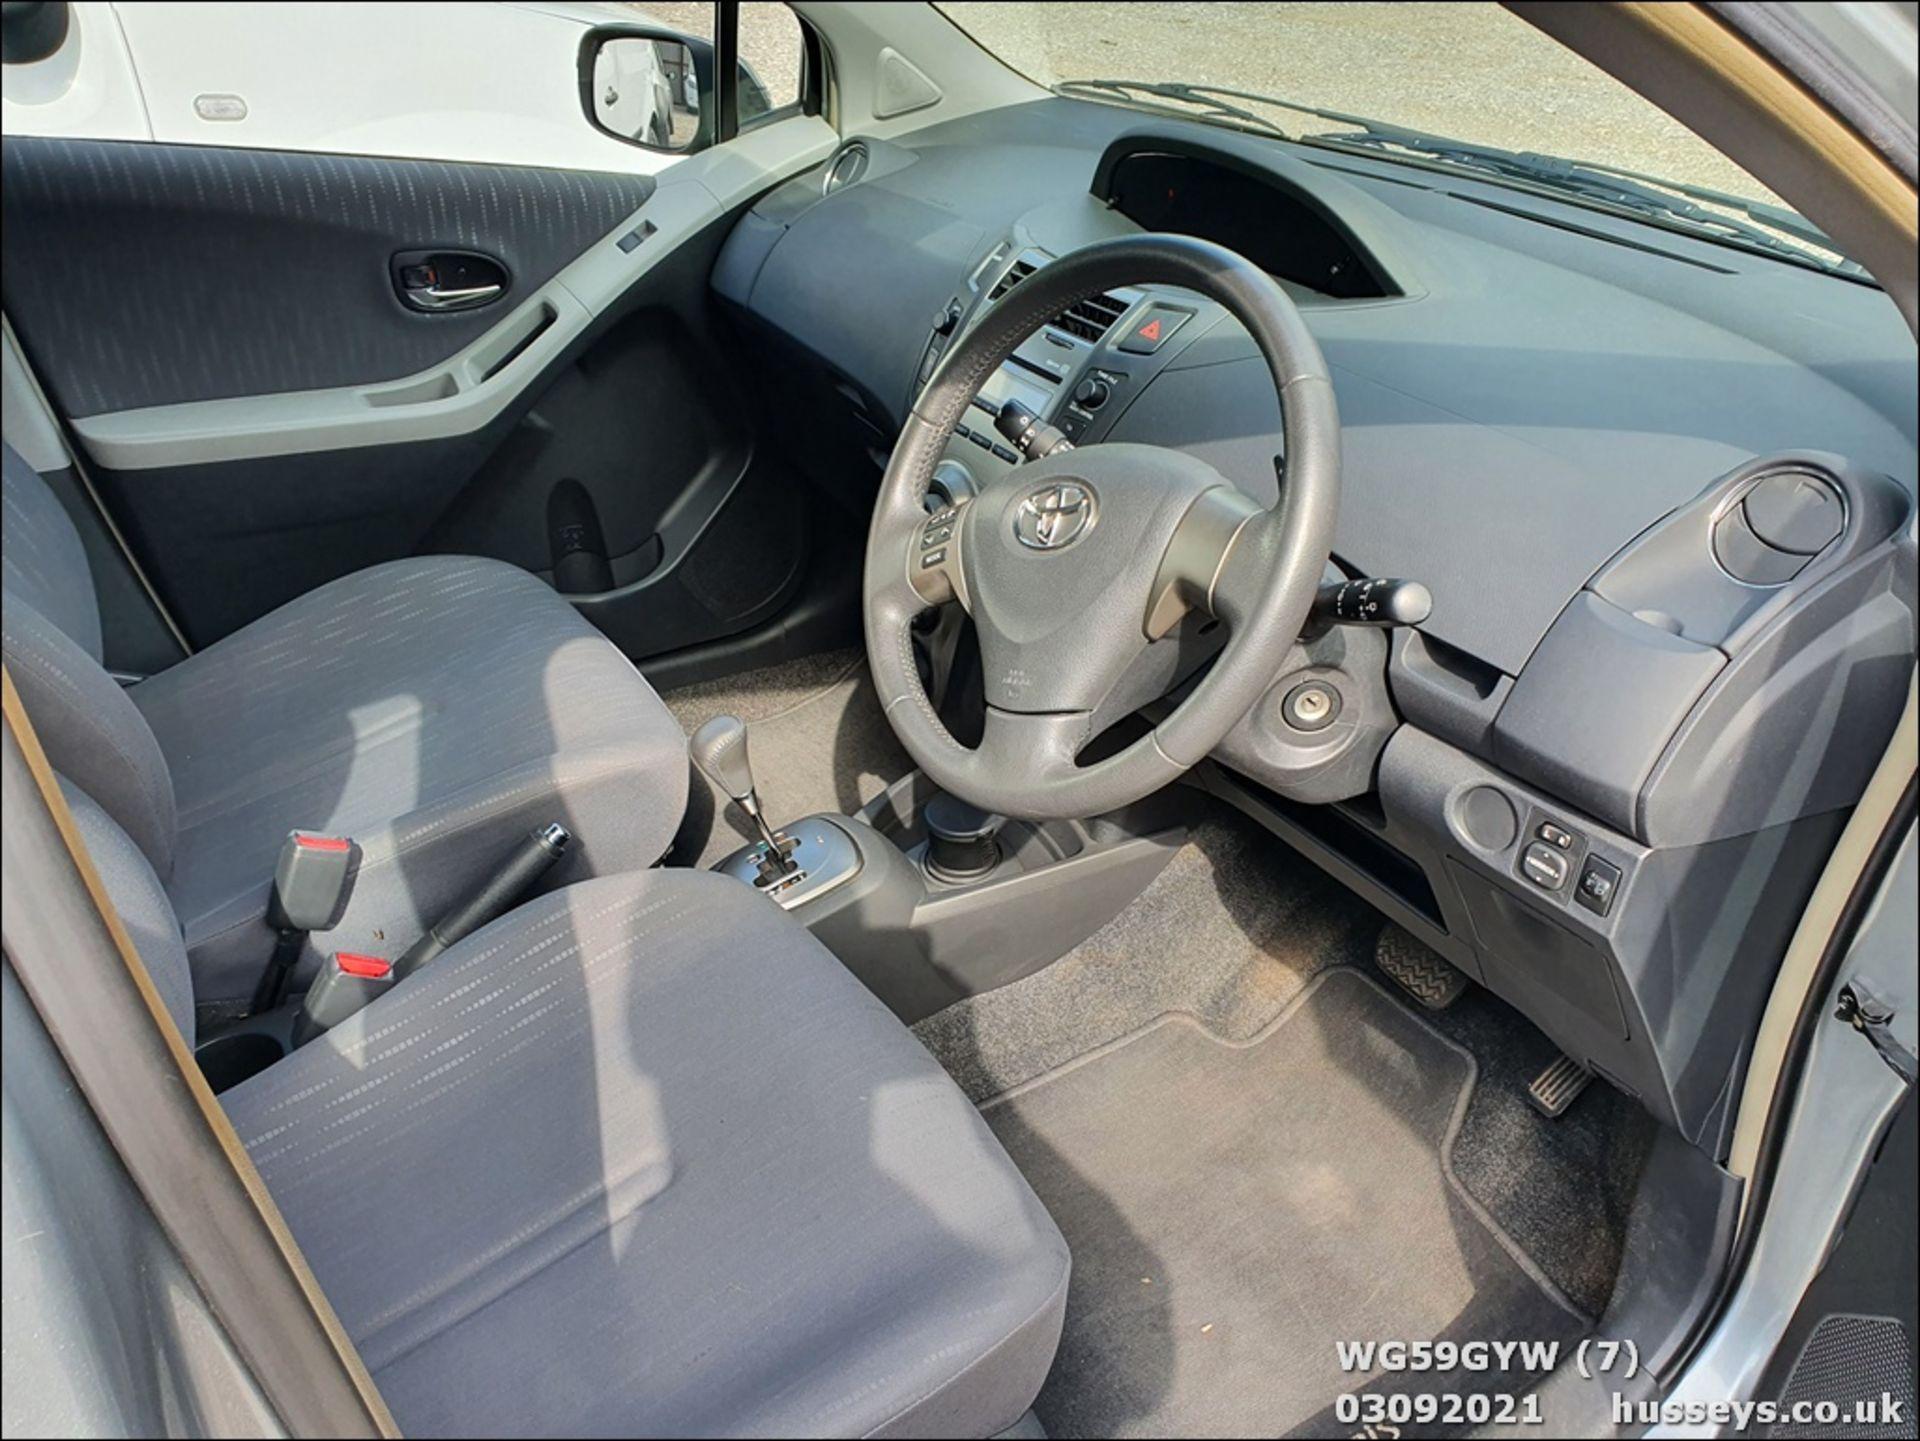 09/59 TOYOTA YARIS TR VVT-I S-A - 1329cc 5dr Hatchback (Silver, 87k) - Image 7 of 12